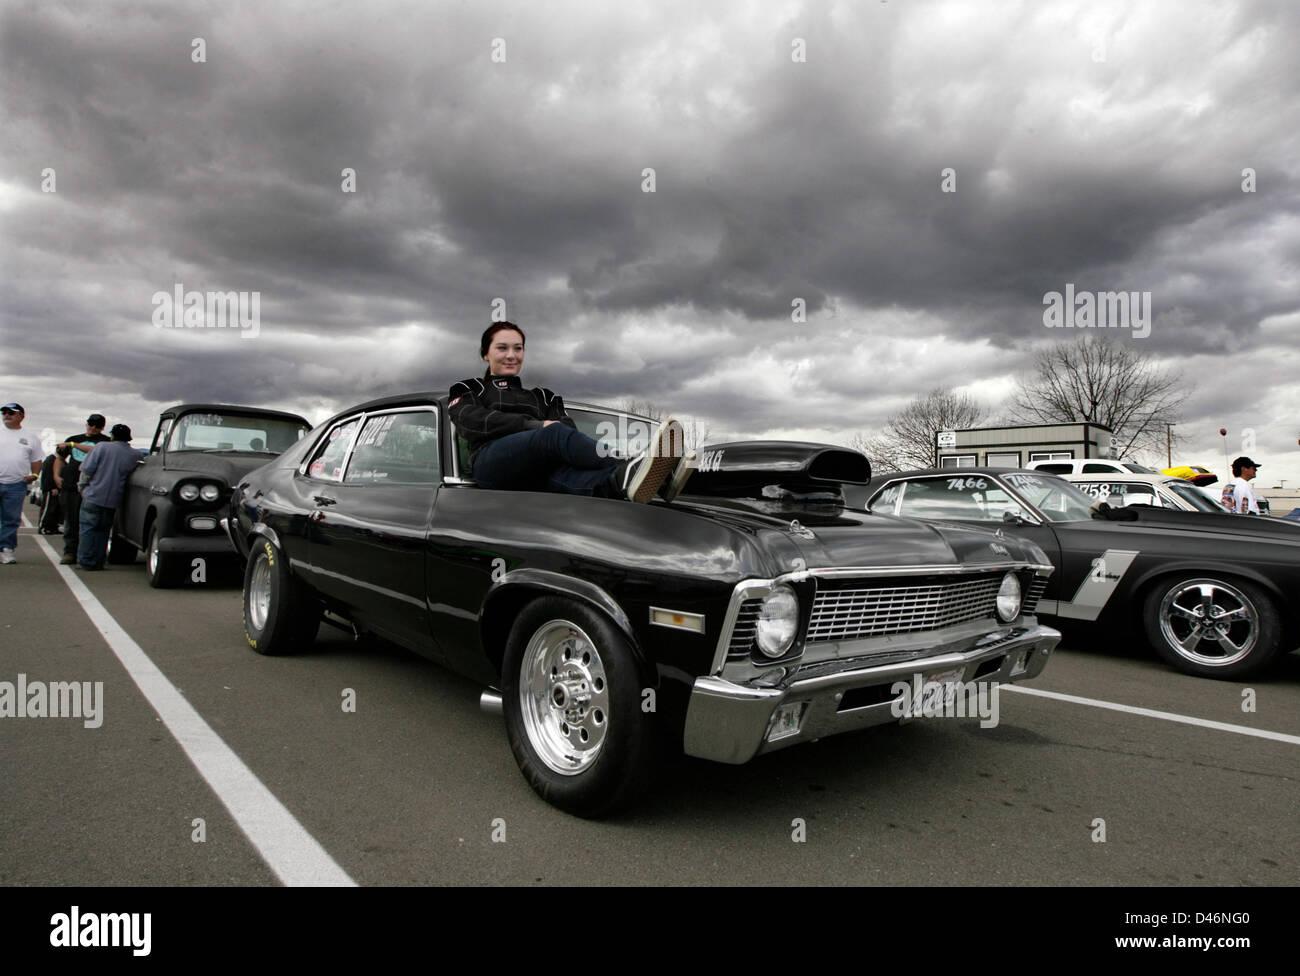 March 6, 2013 - Bakersfield, CA, USA - Felix Adamo / The Californian.No worries. Despite threatening skies and tough - Stock Image